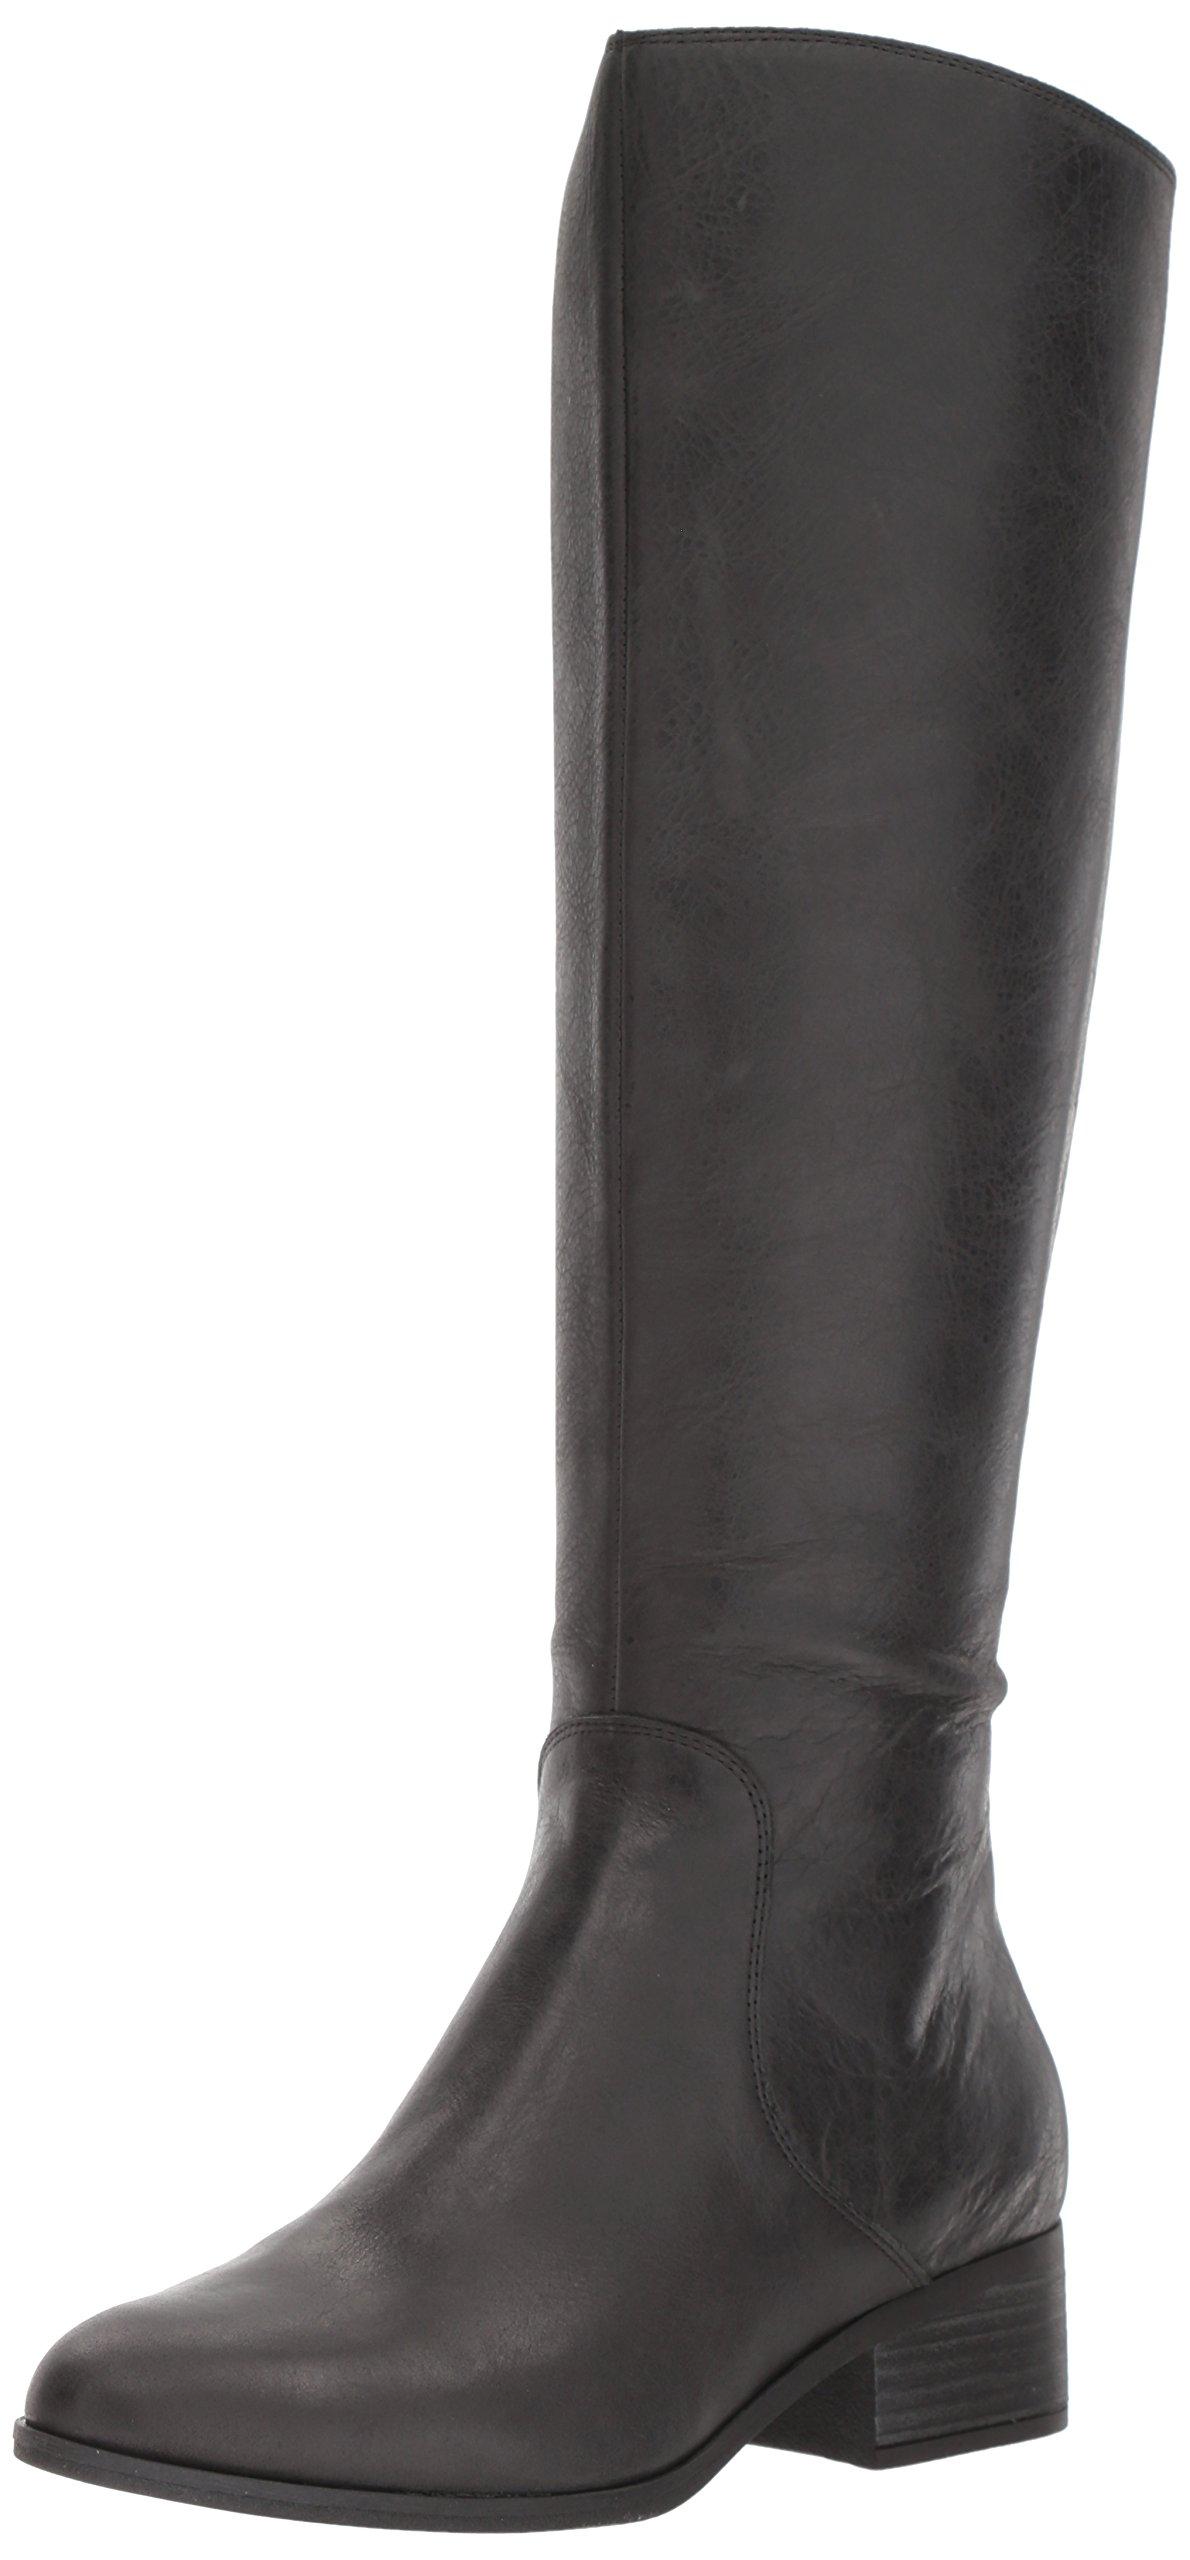 Lucky Women's LK-Lanesha Equestrian Boot, Black, 8.5 Medium US